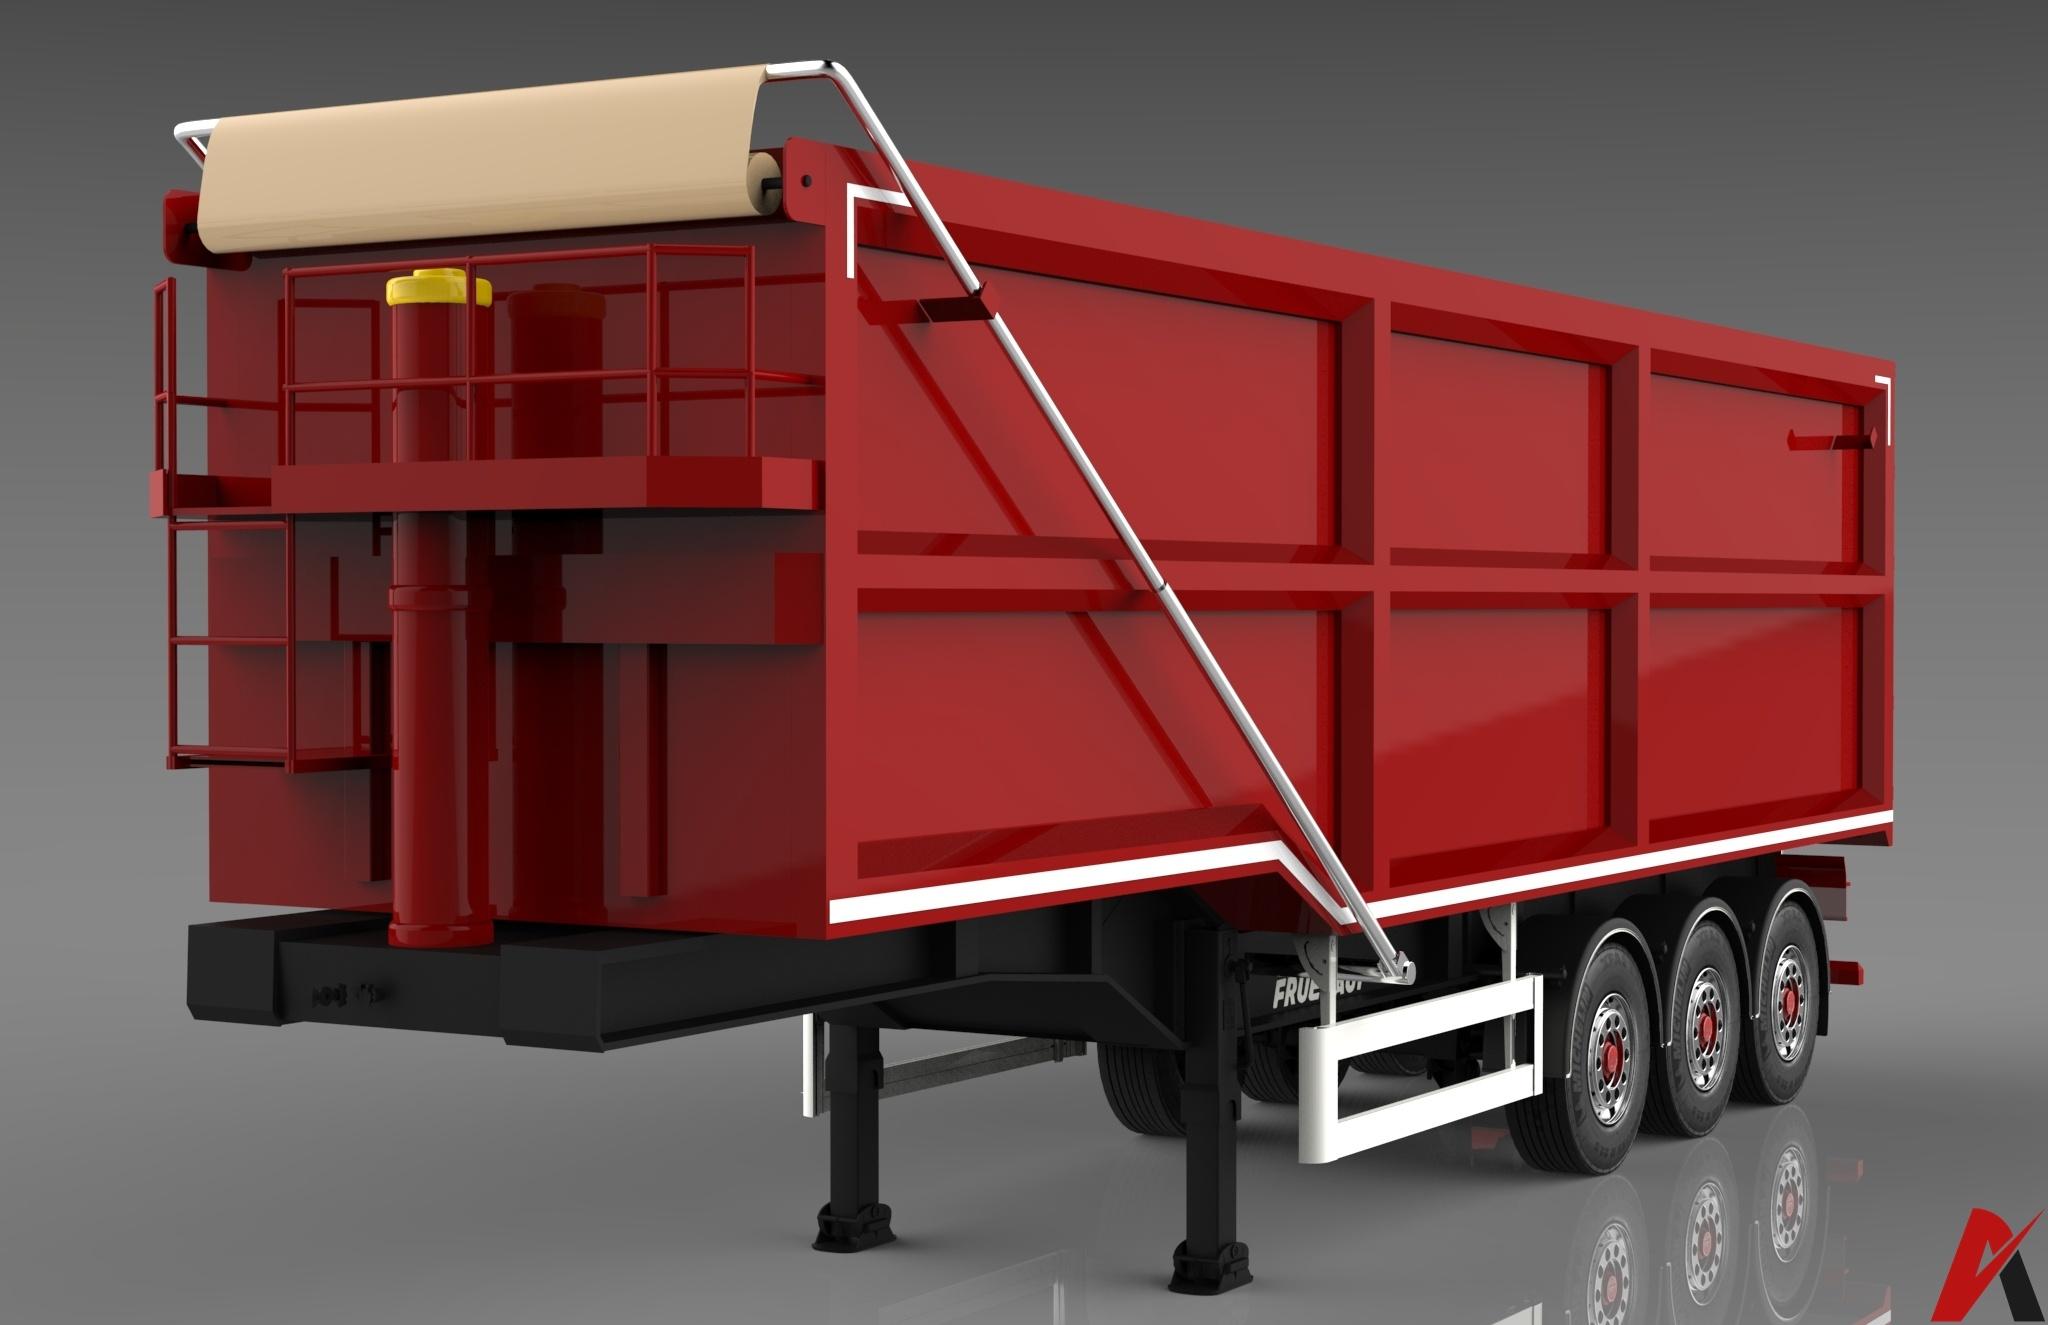 3D Fruehauf Steel Bulker Trailer Model